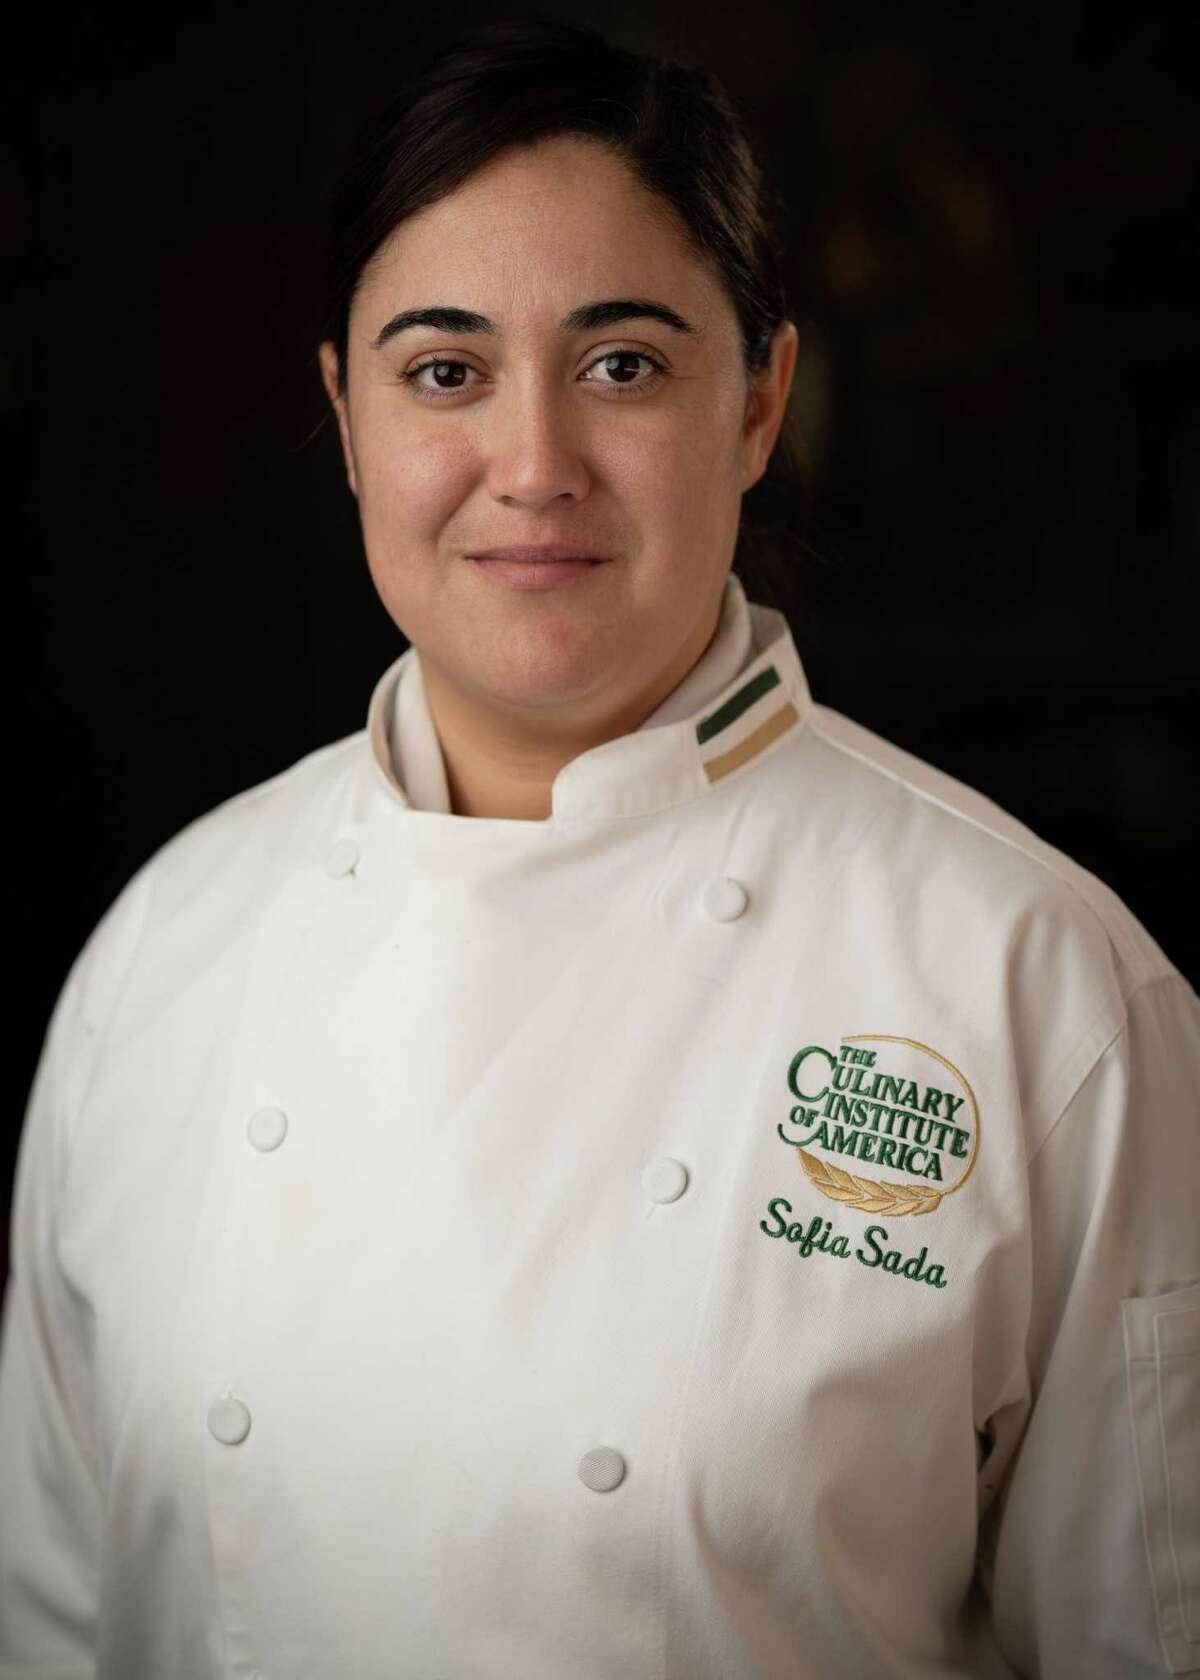 Sofia Sada Cervantes, The Culinary Institute of America, San Antonio